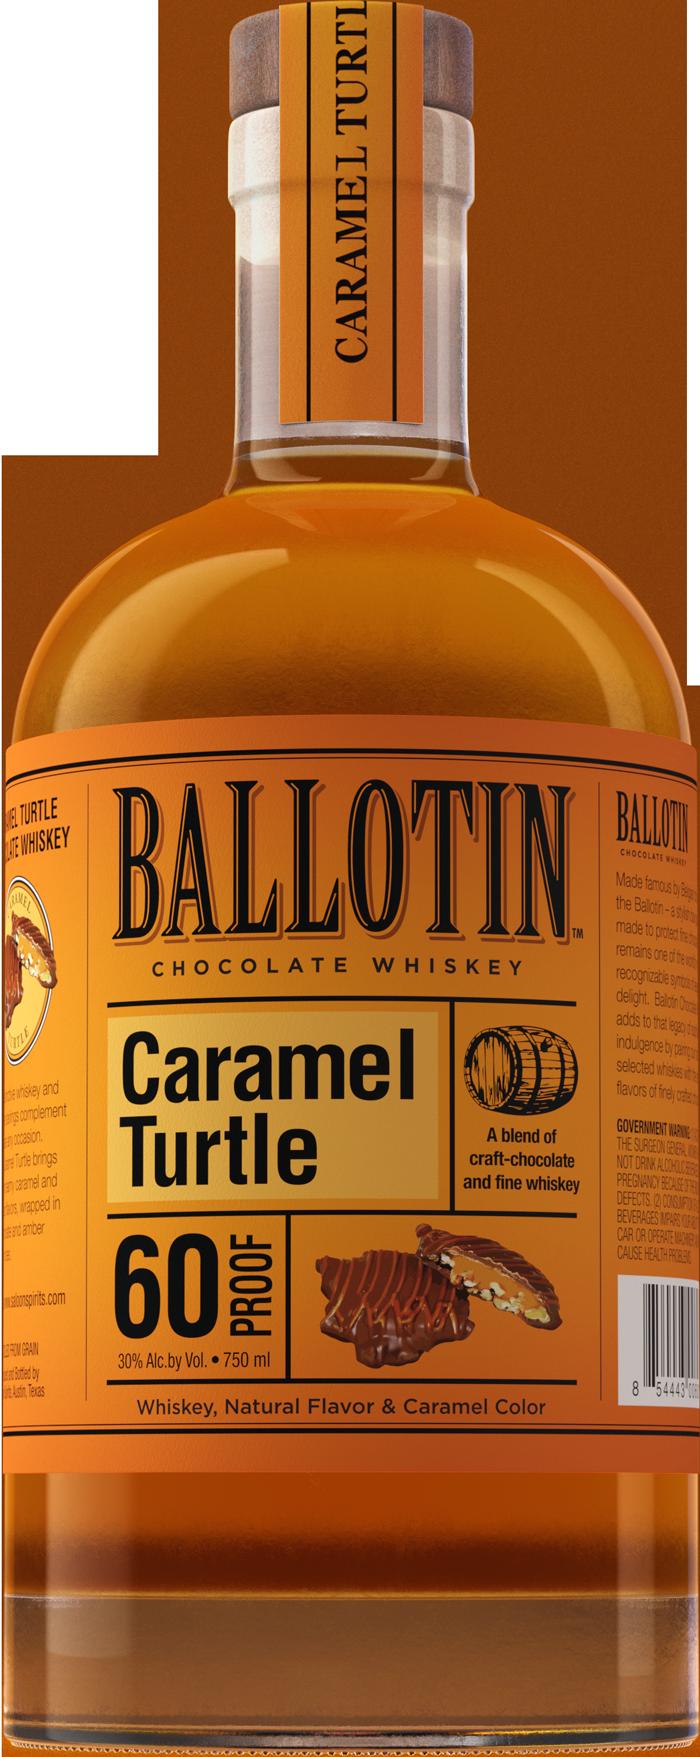 Caramel Turtle